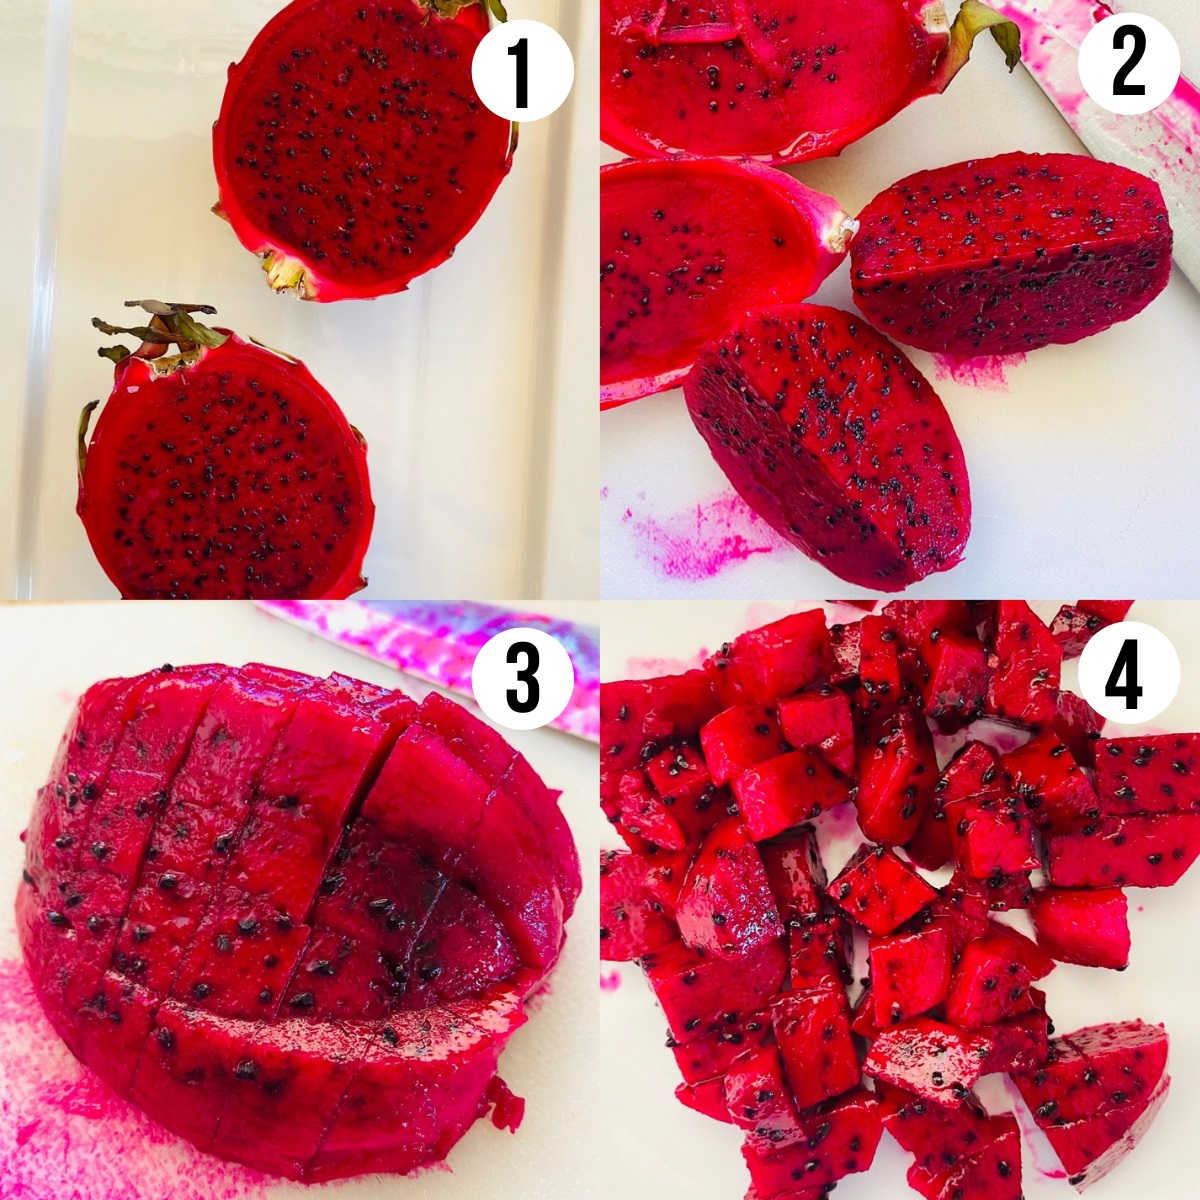 how to cut a dragon fruit process shots 1 though 4